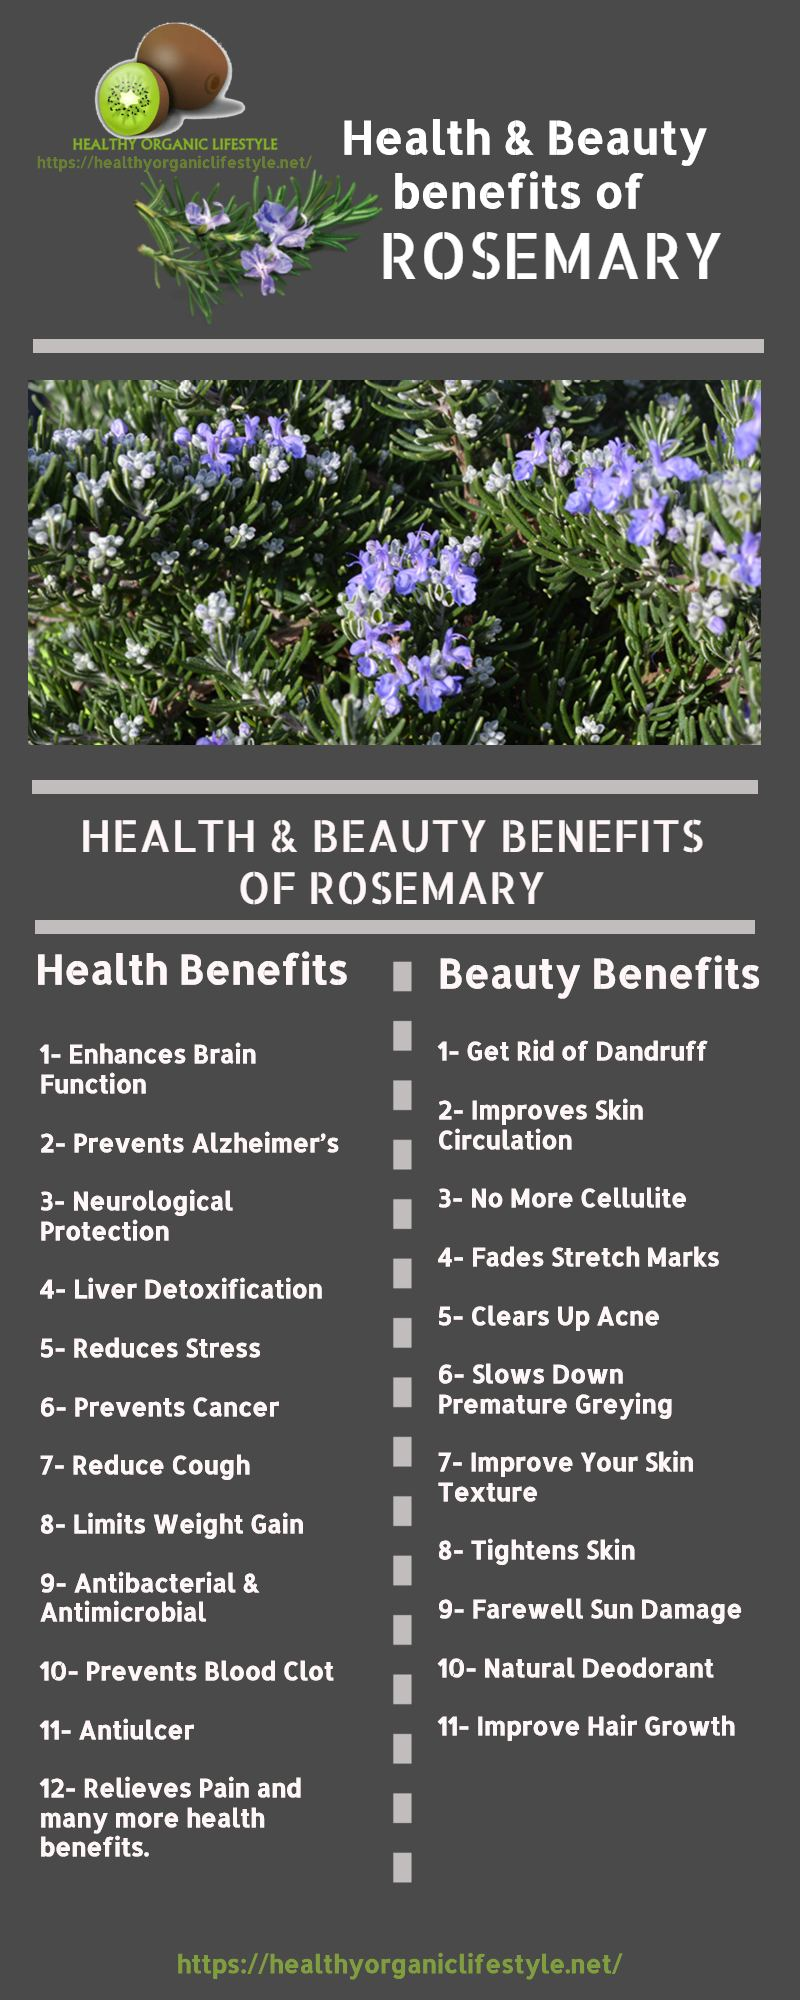 Health and beauty benefits of Rosemary